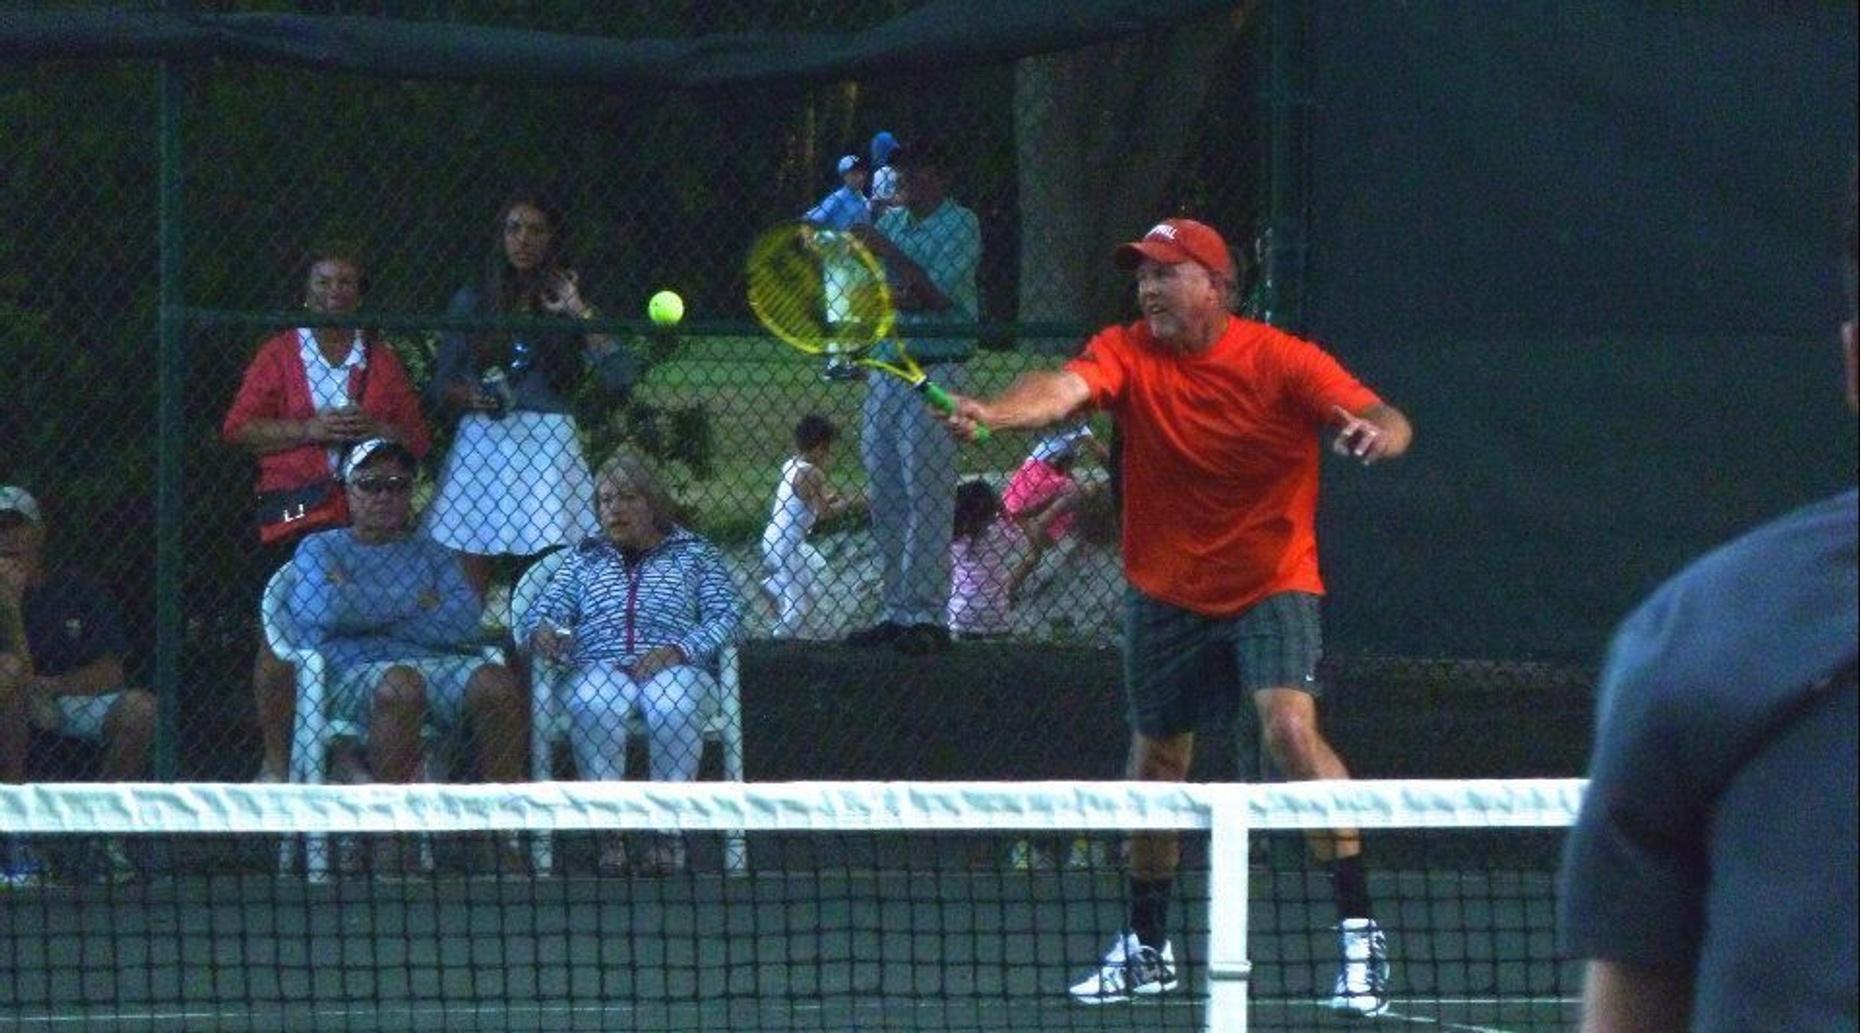 Tennis Strokes Class on Hilton Head Island